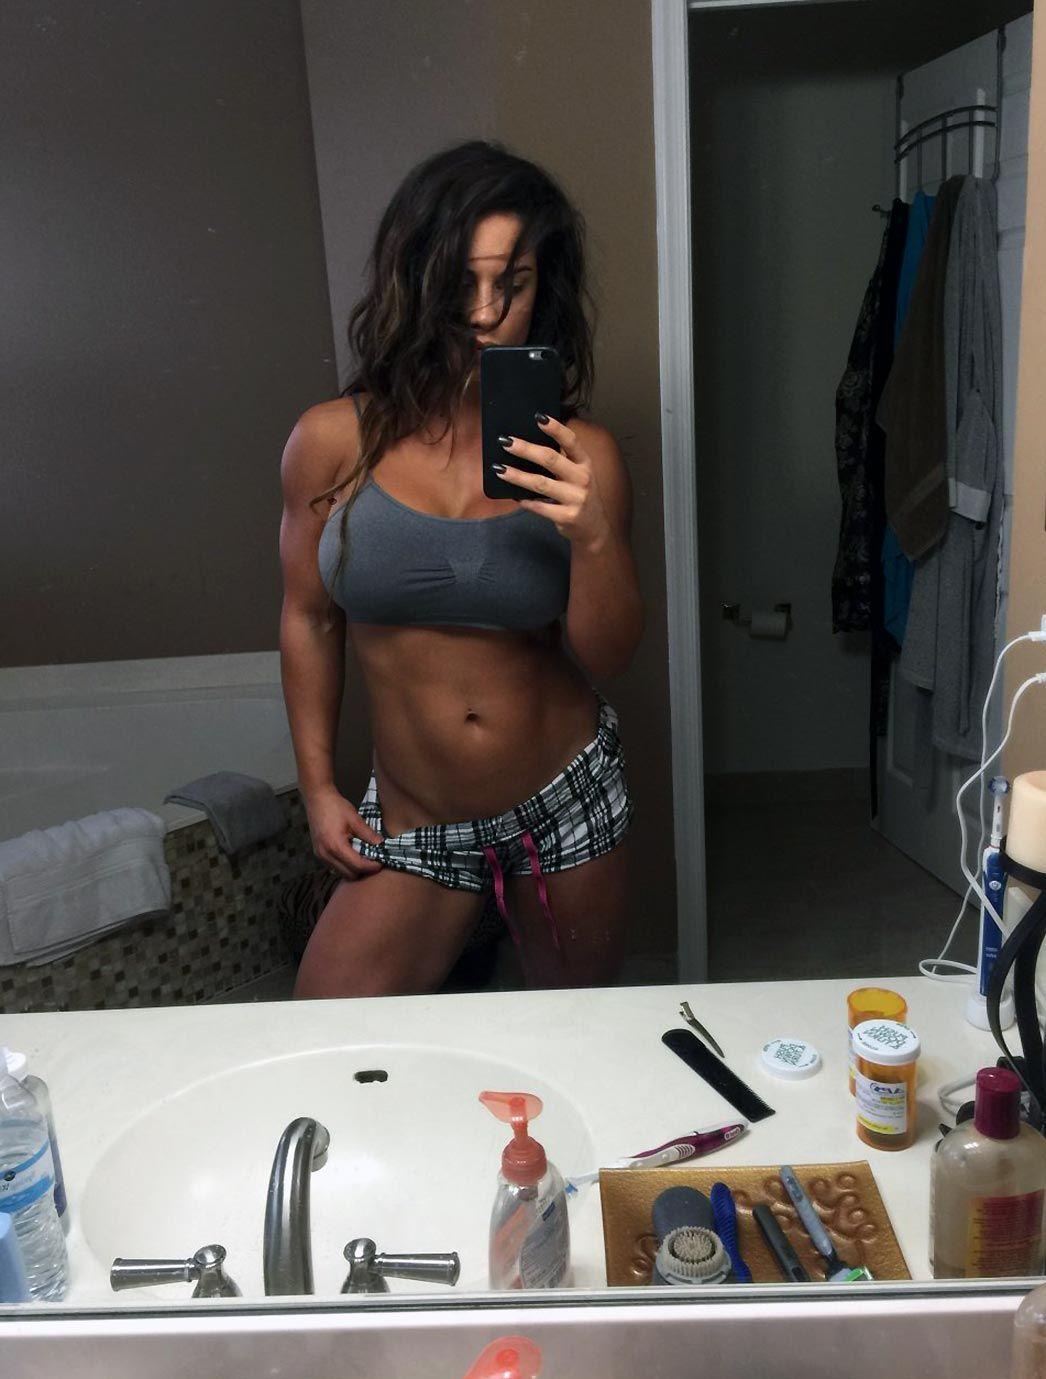 Celeste Bonin Nude Leaked The Fappening & Sexy 0242